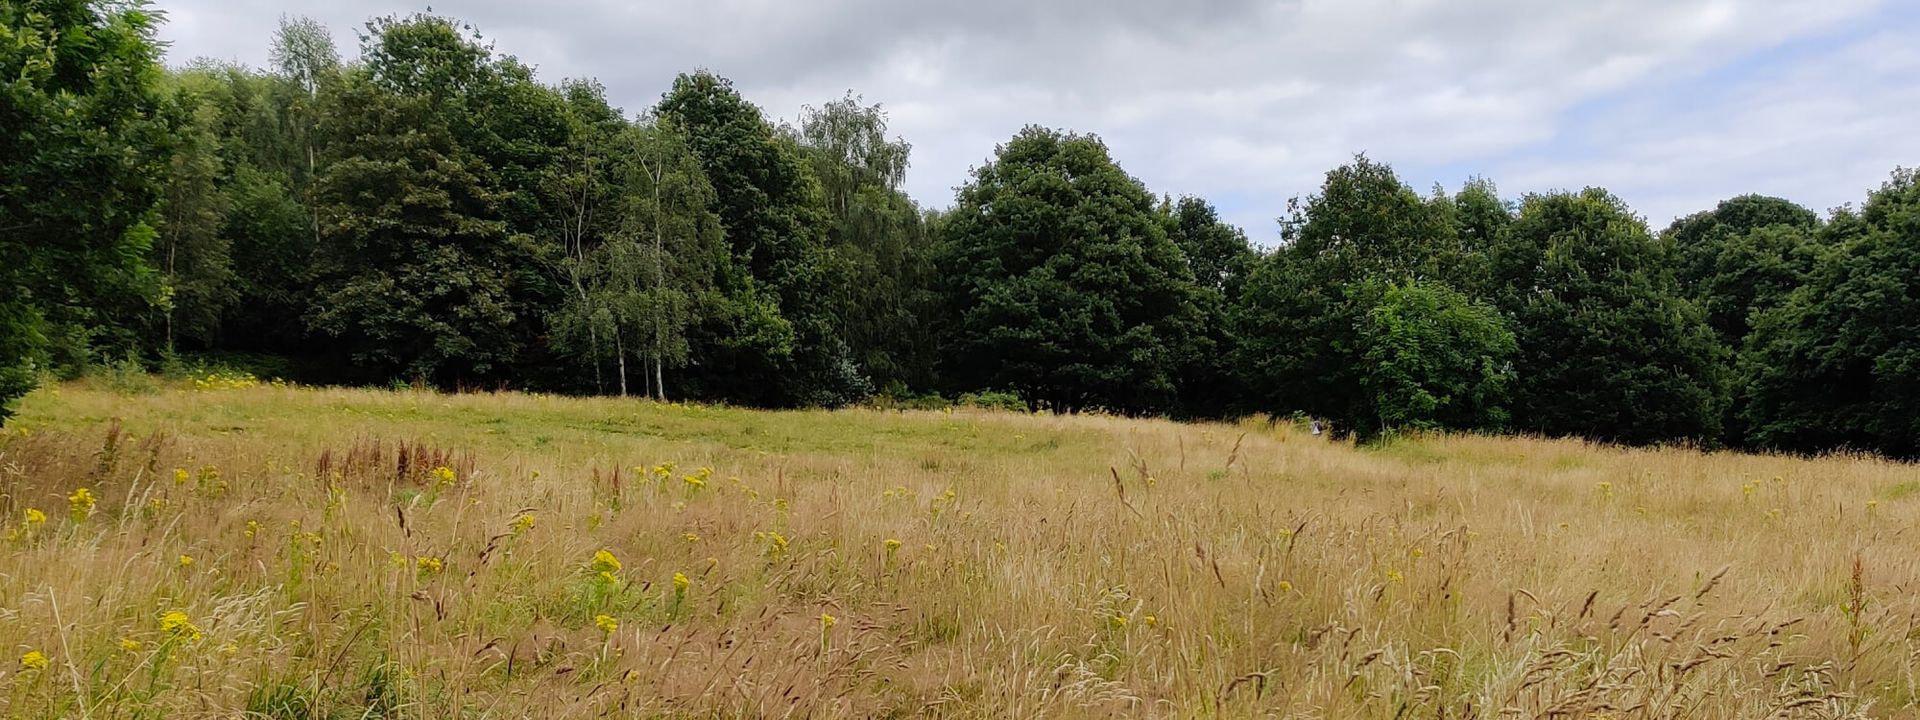 Sugarwell Hill Park wild flower meadow